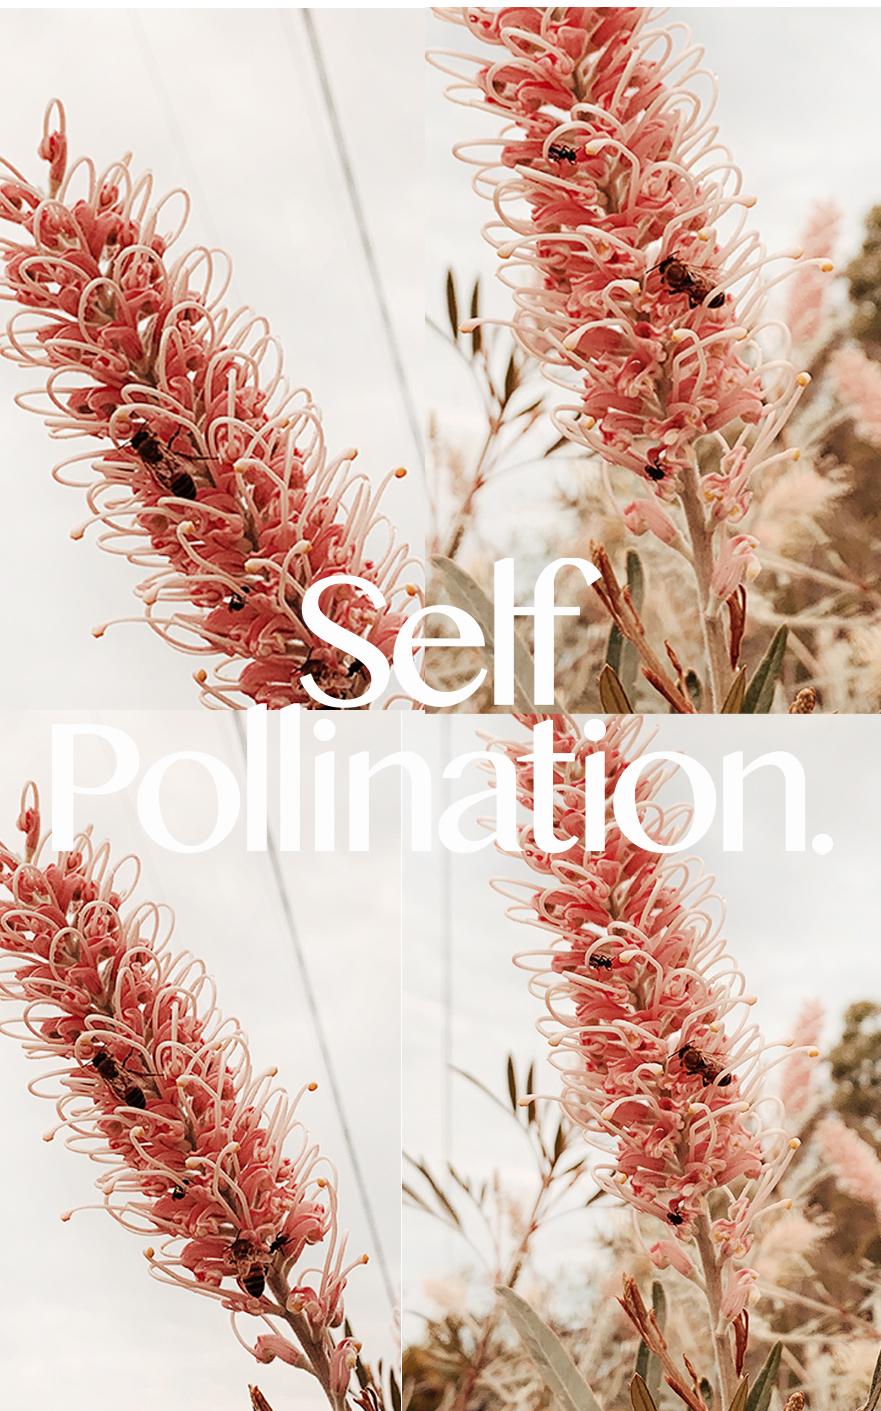 AugustJournal-SelfPollination.jpg